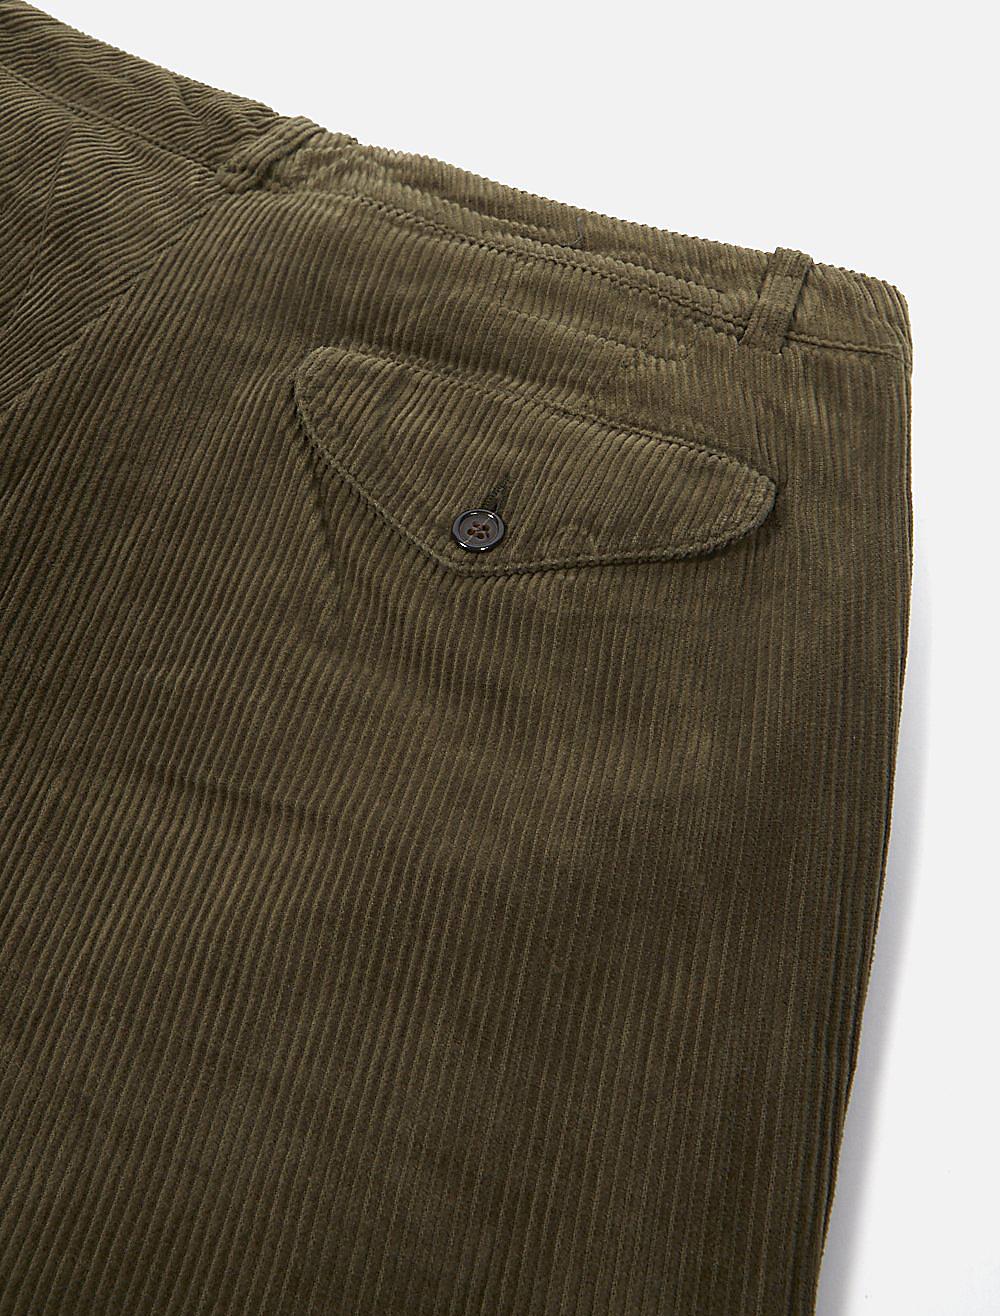 Universal Works Aston Pant Cord Olive dettaglio tasca